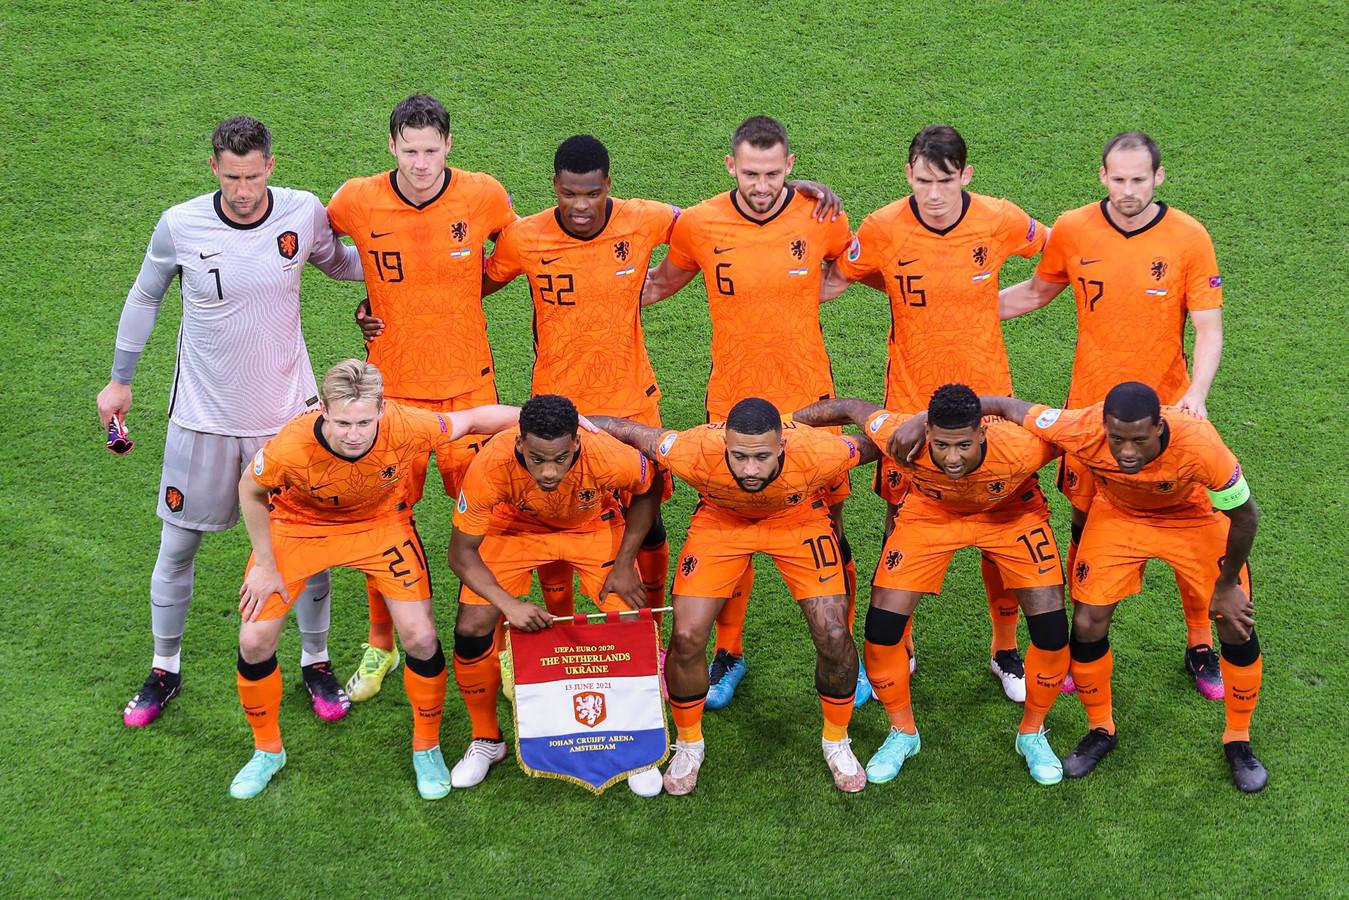 De basiself van Oranje tegen Oekraïne.